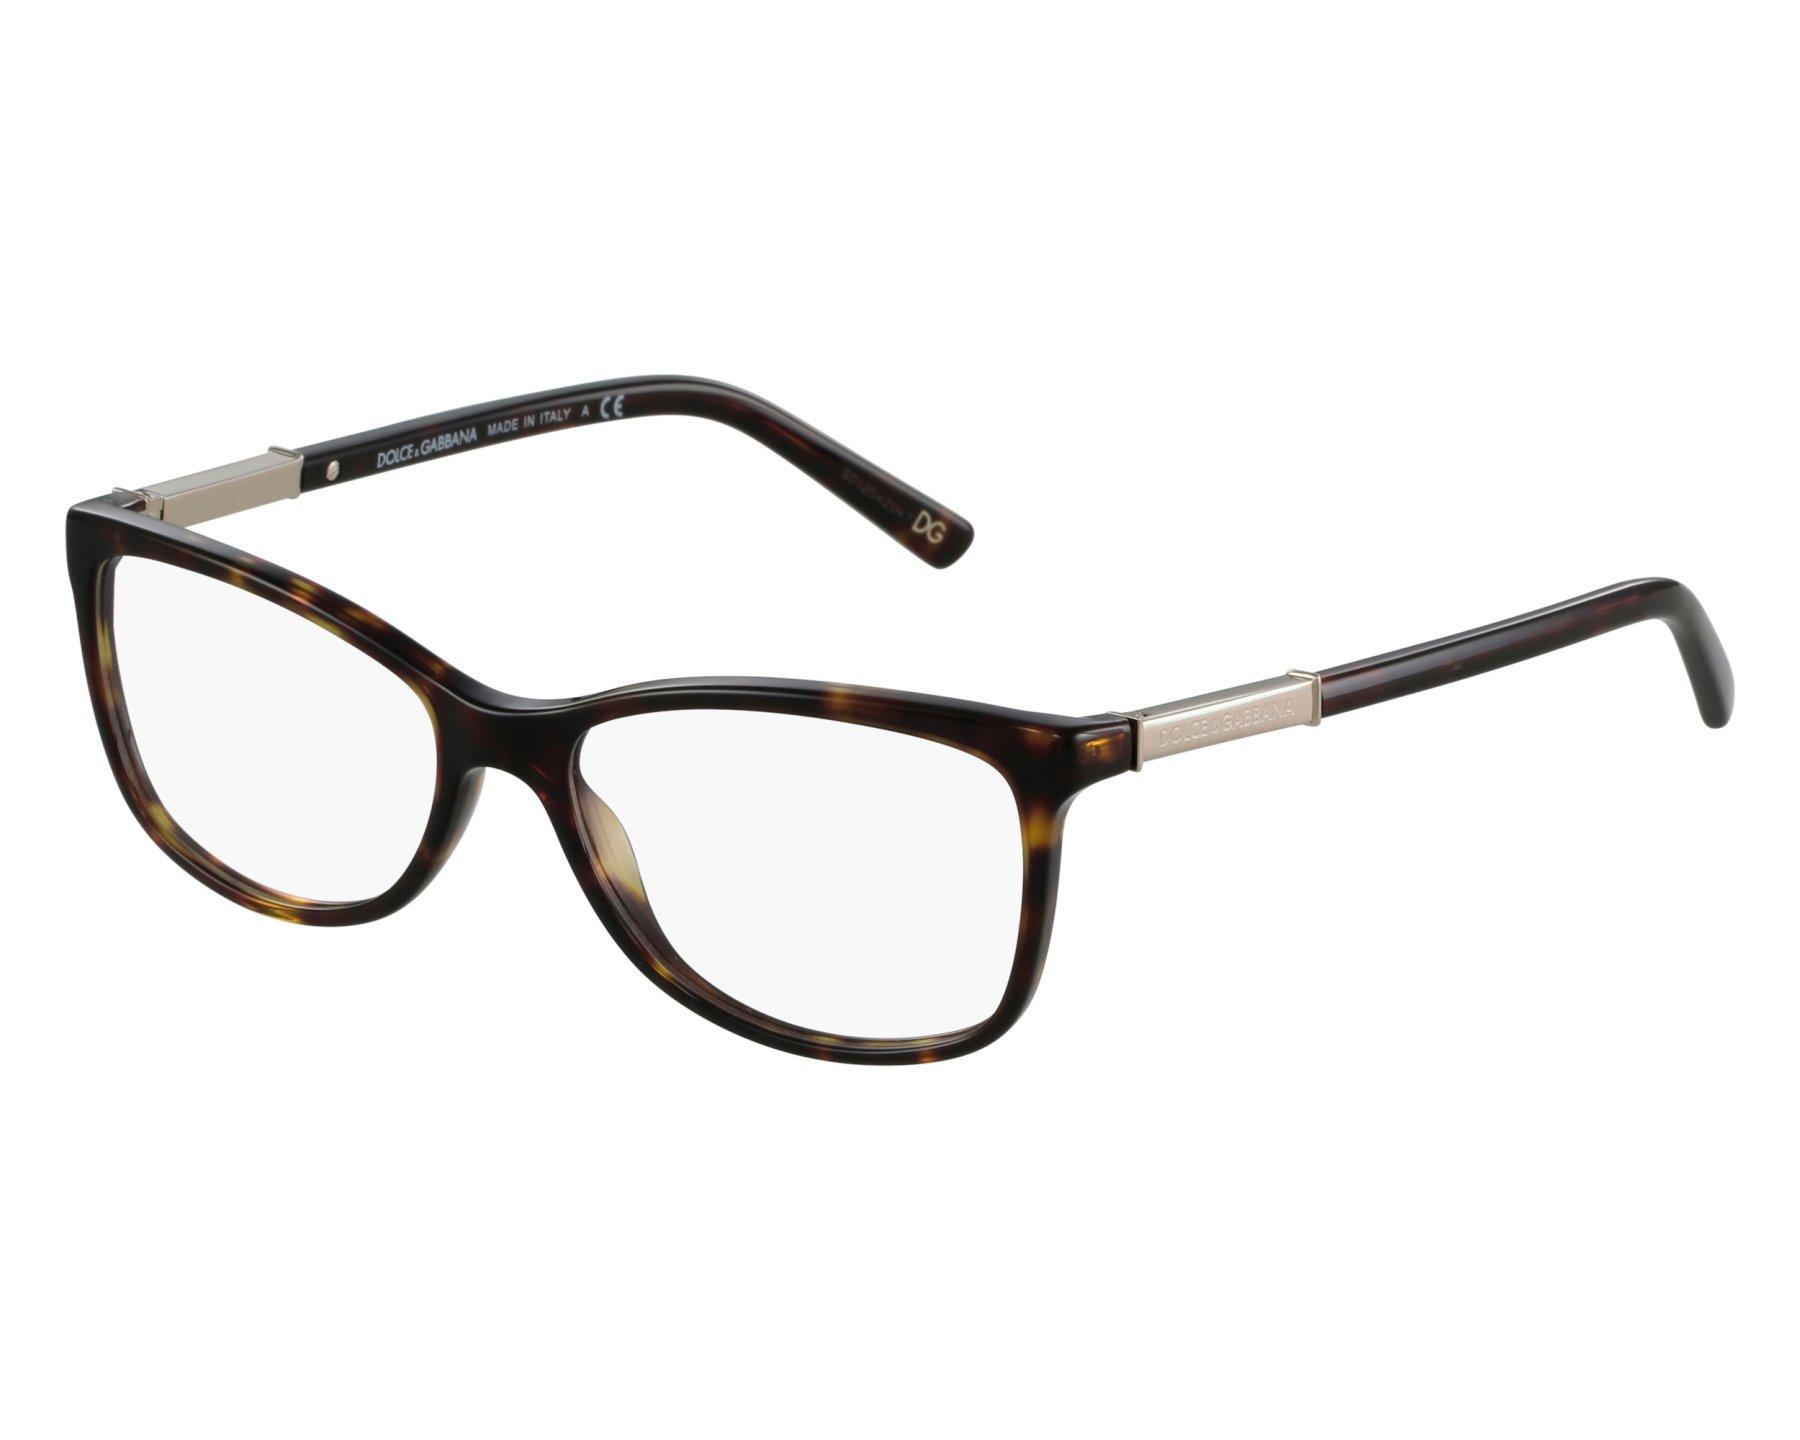 lunettes de vue dolce gabbana dg 3107 502 havane. Black Bedroom Furniture Sets. Home Design Ideas